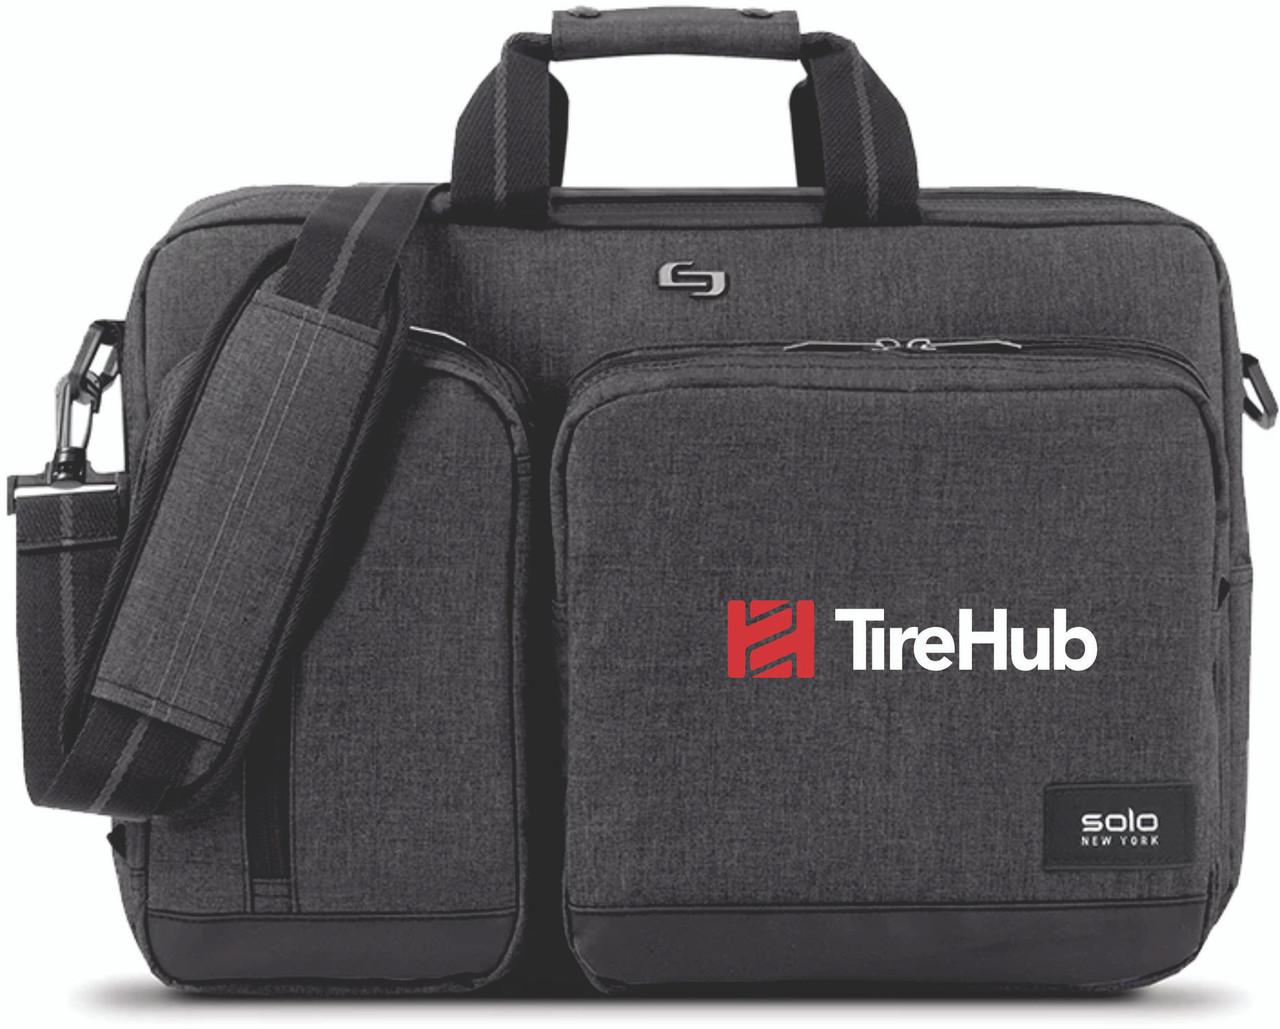 Tirehub Duane Hybrid Briefcase Backpack Tirehubmerchandise